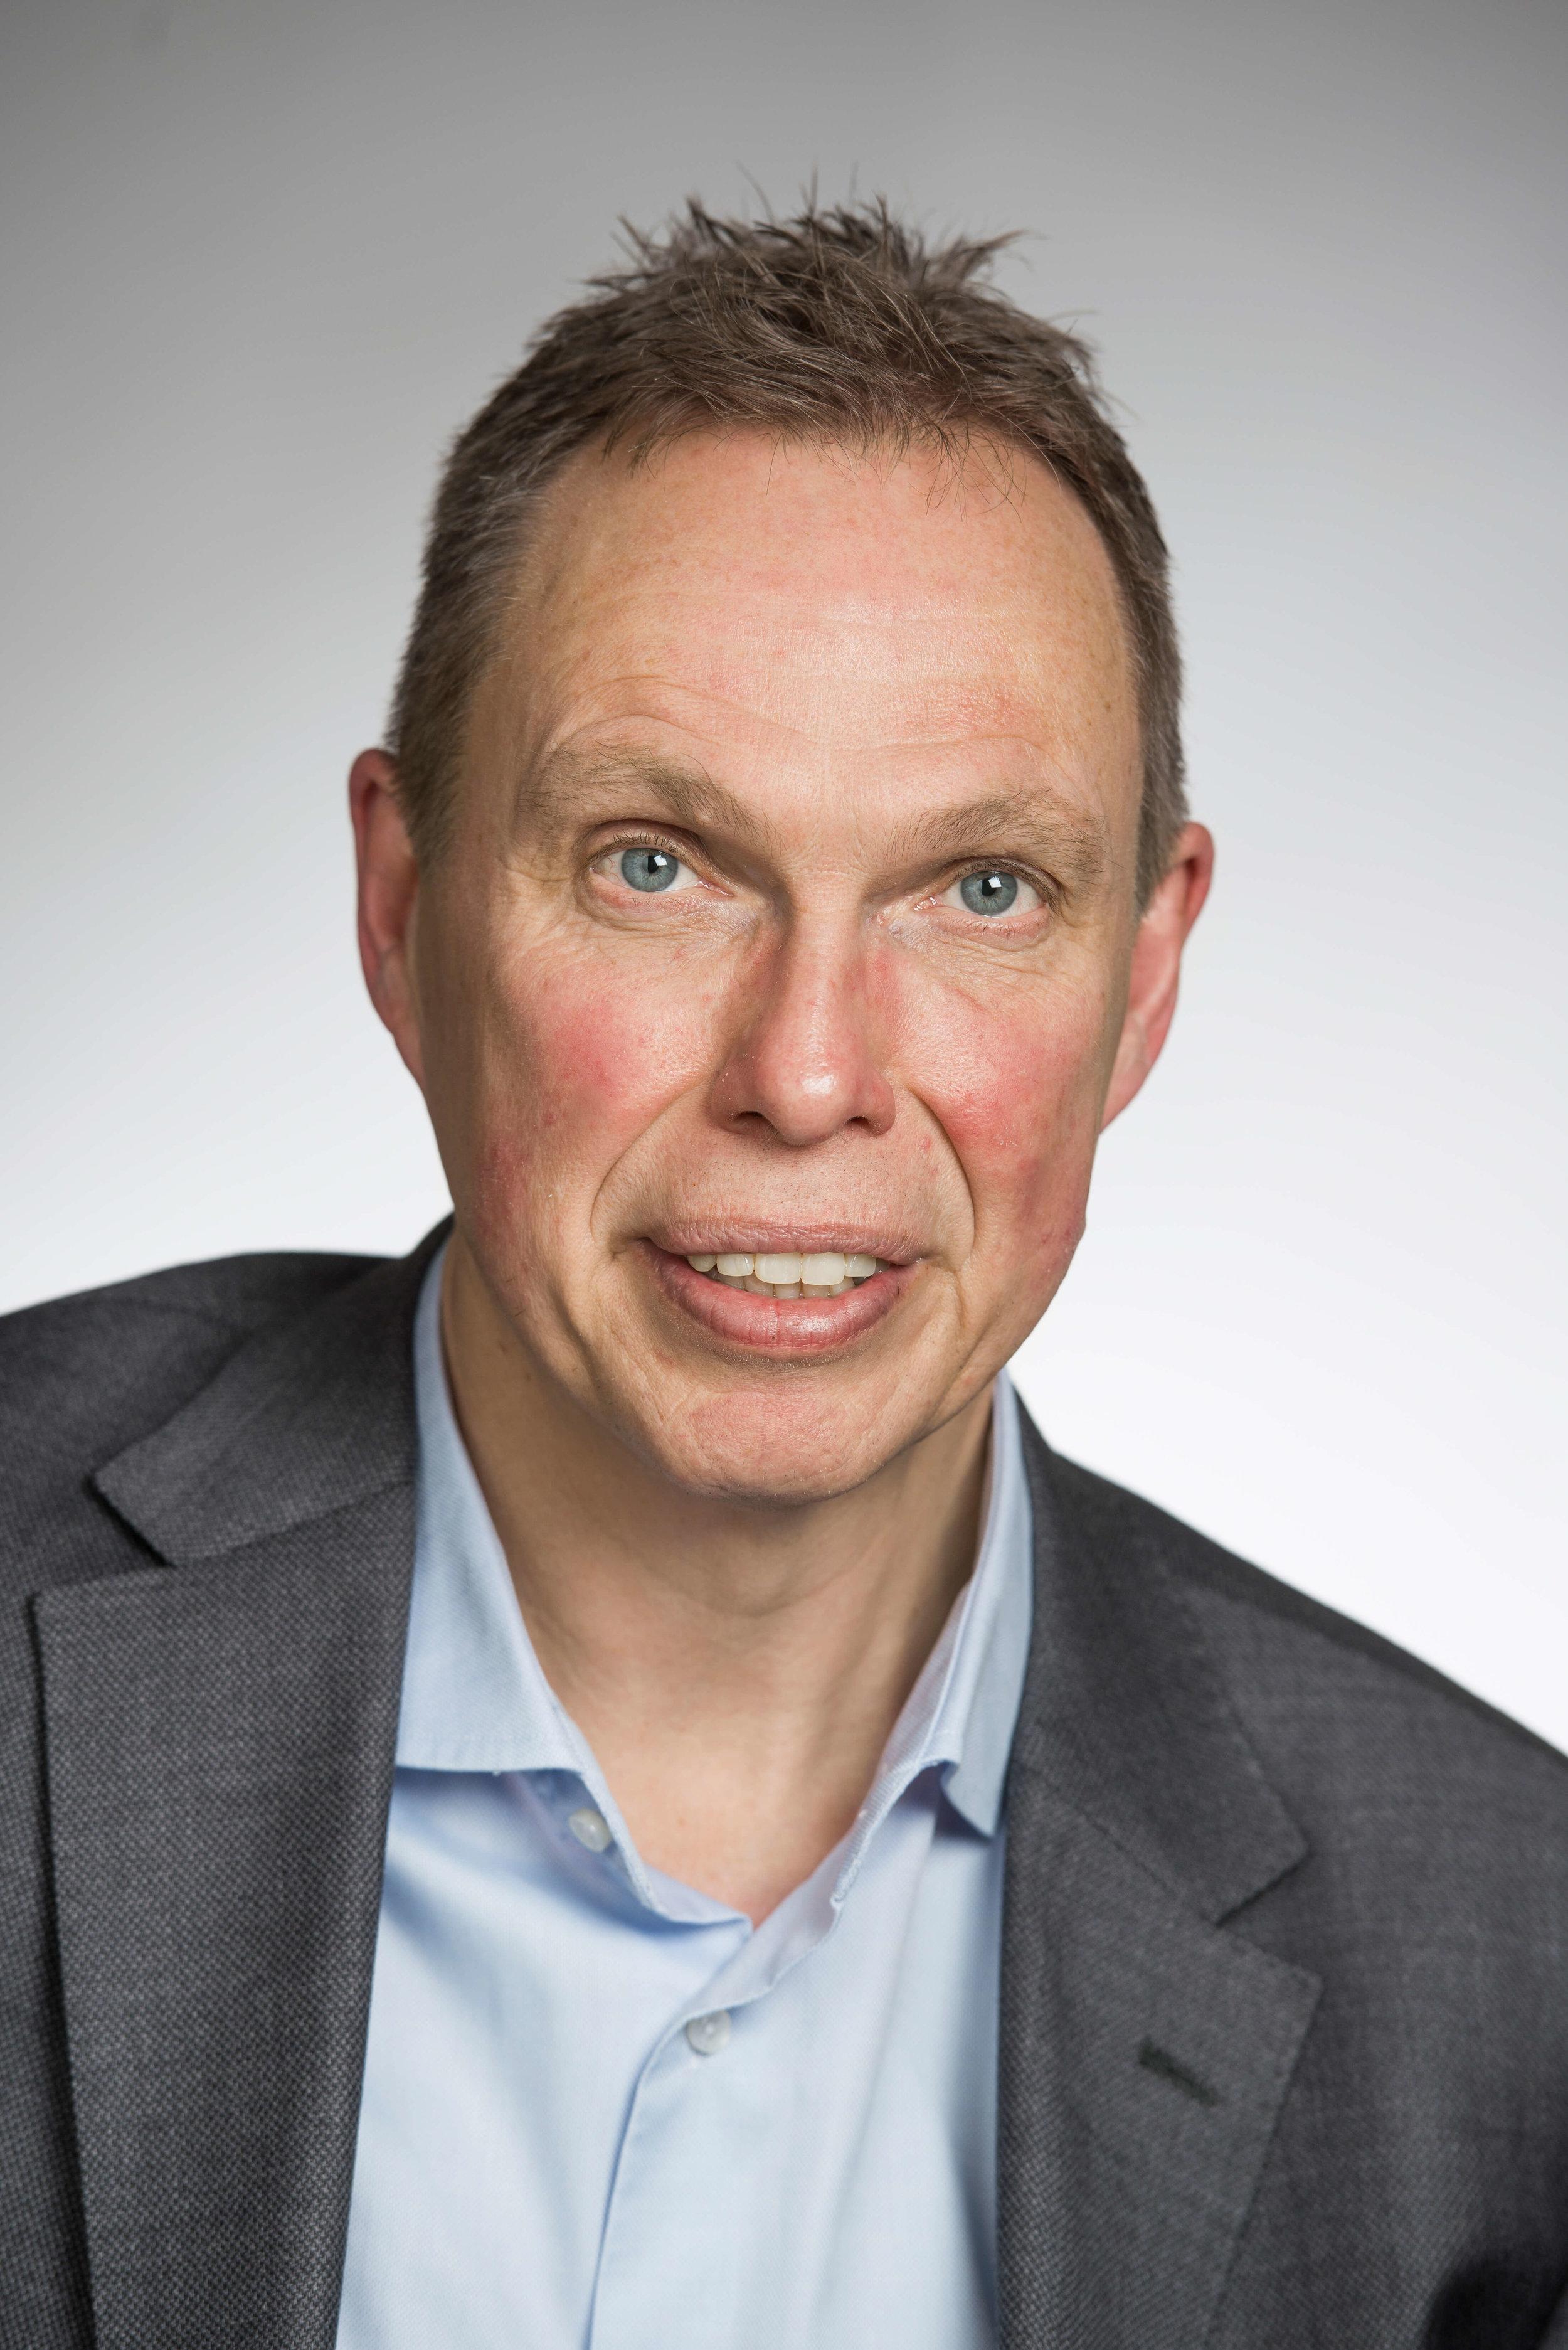 Gunnar-Larsson-2.jpg